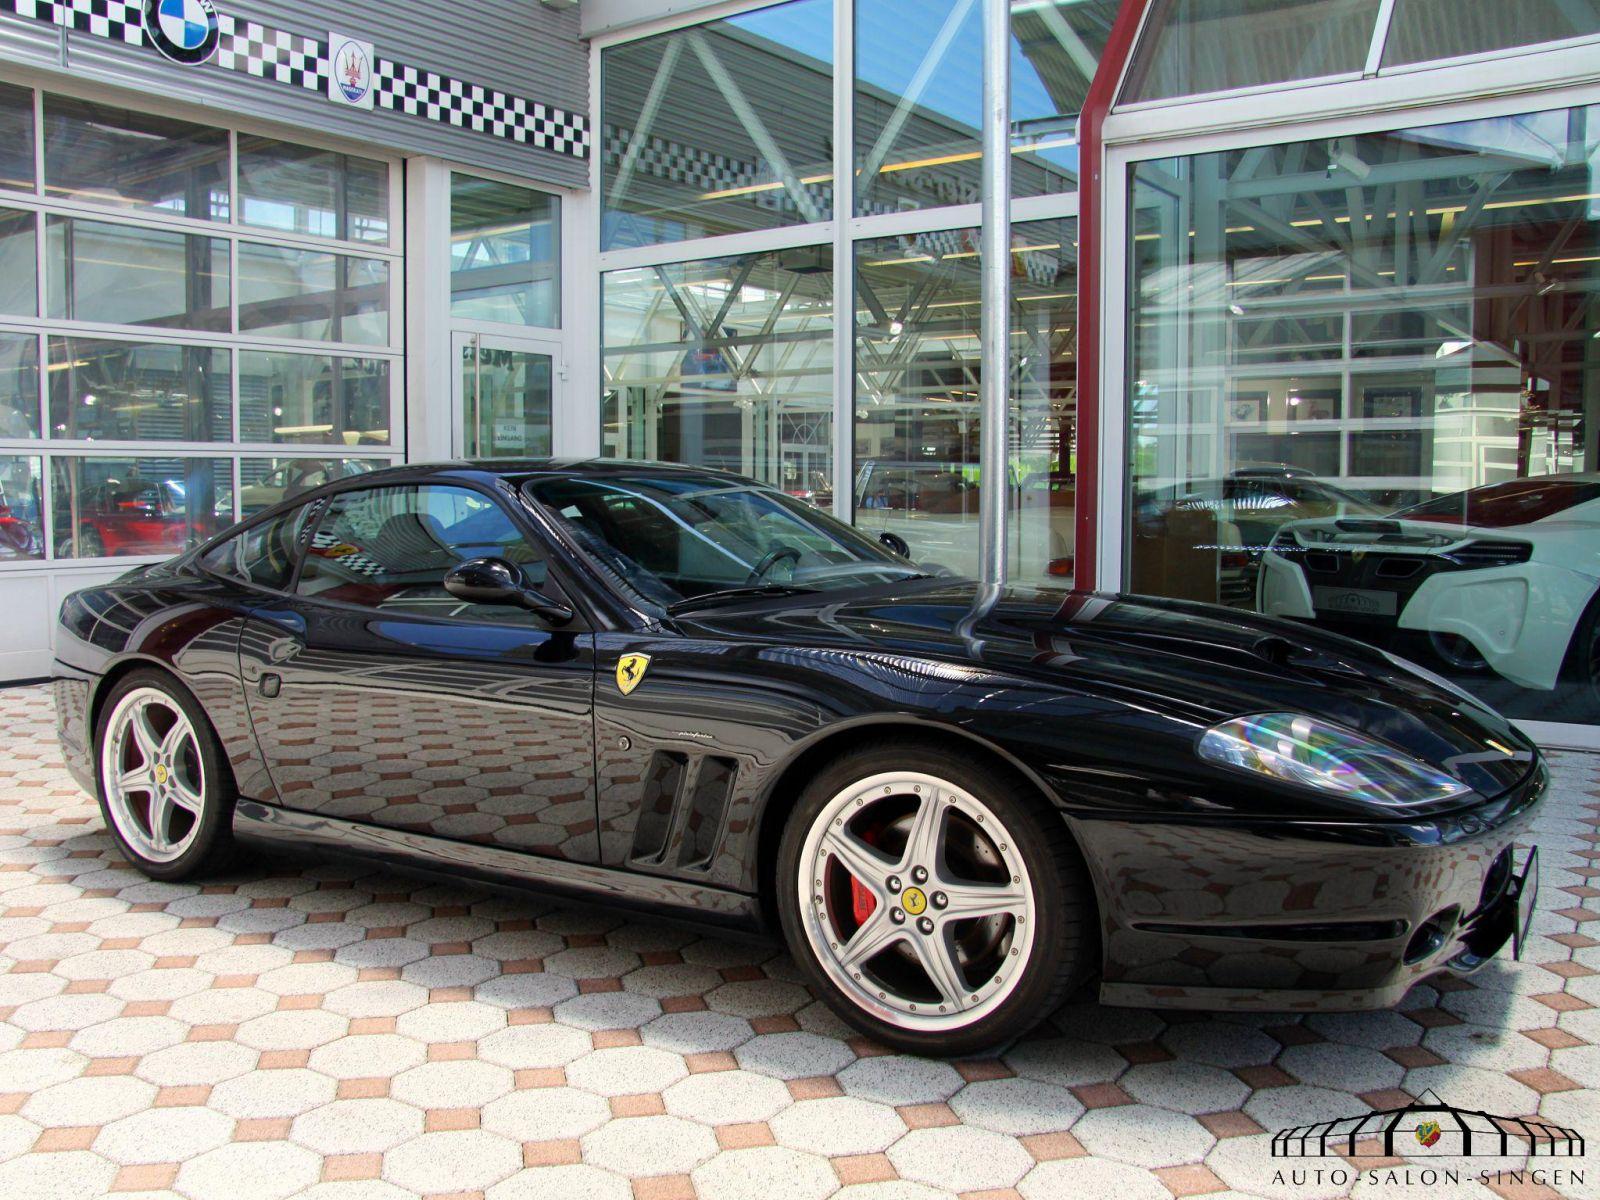 Ferrari 575 M Maranello Coupé Auto Salon Singen